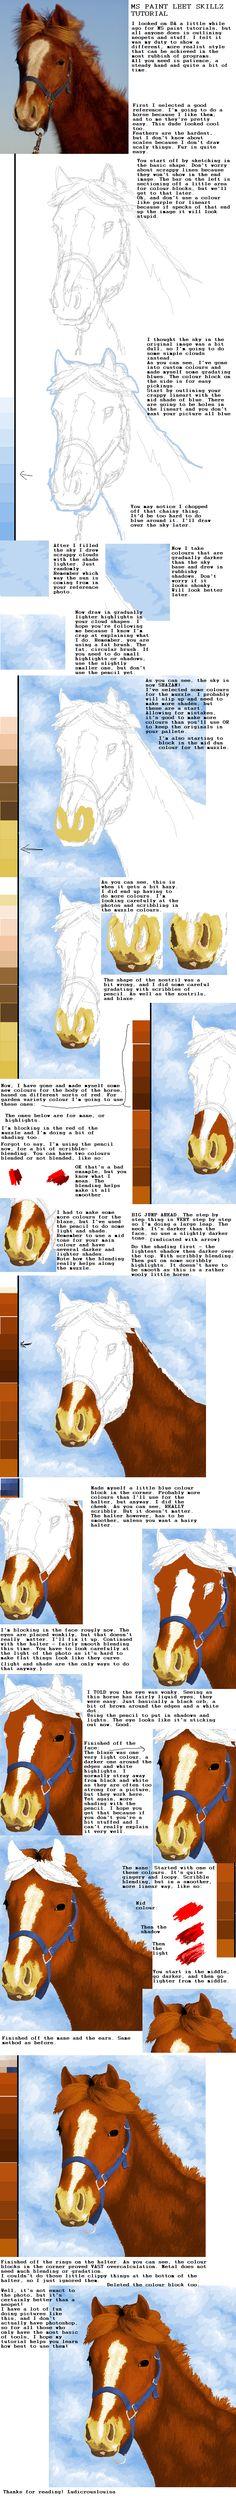 Horses: MS Paint tutorial by ludicrouslouisa.deviantart.com on @deviantART